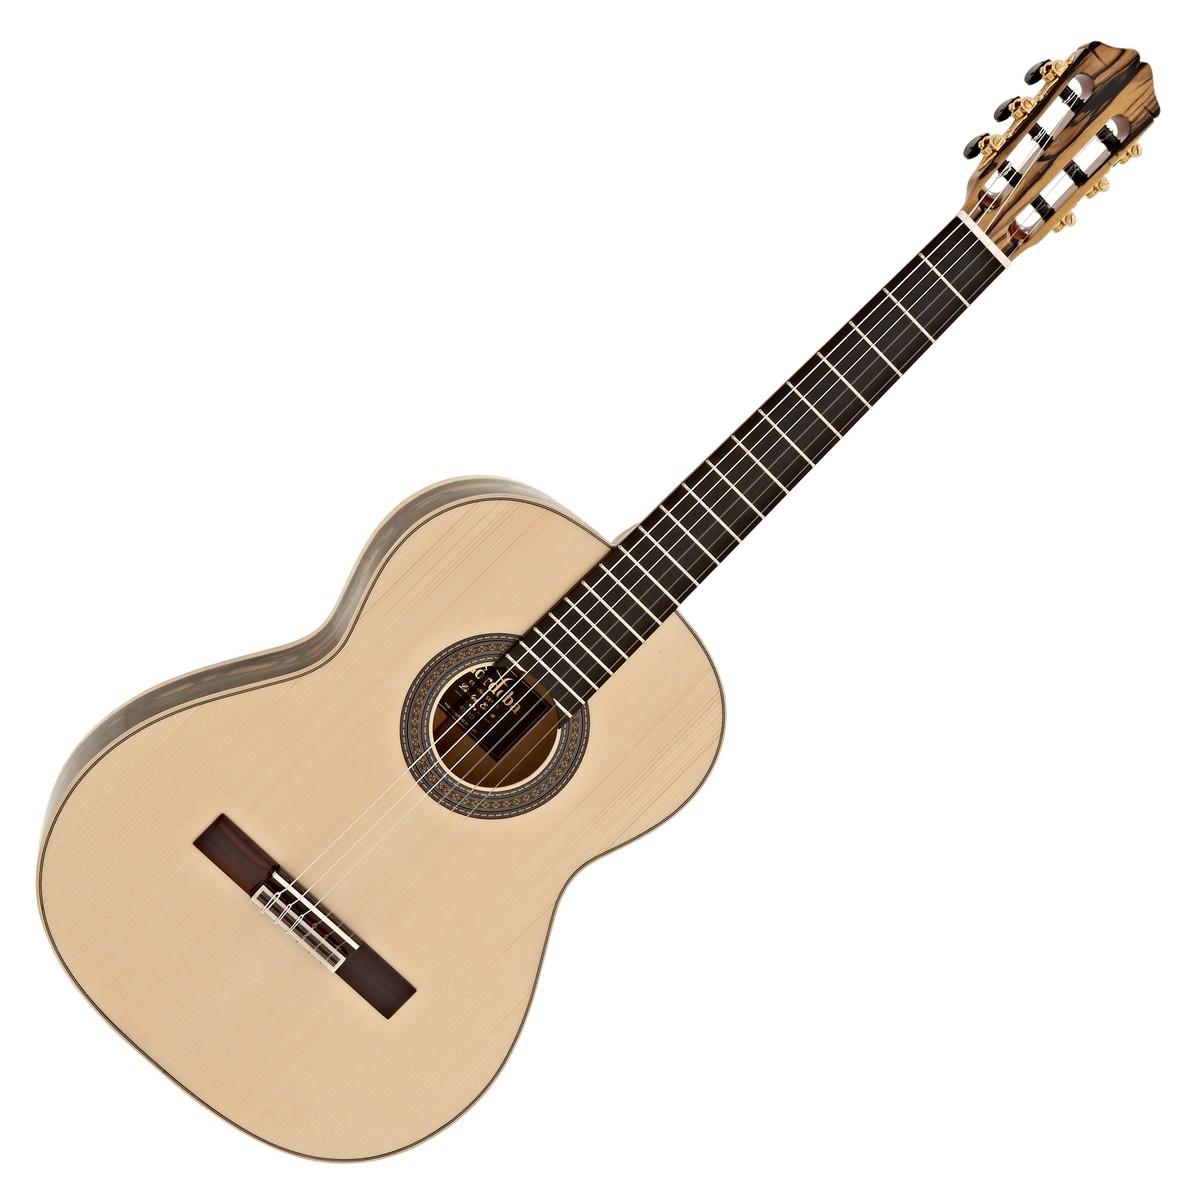 guitare classique bois